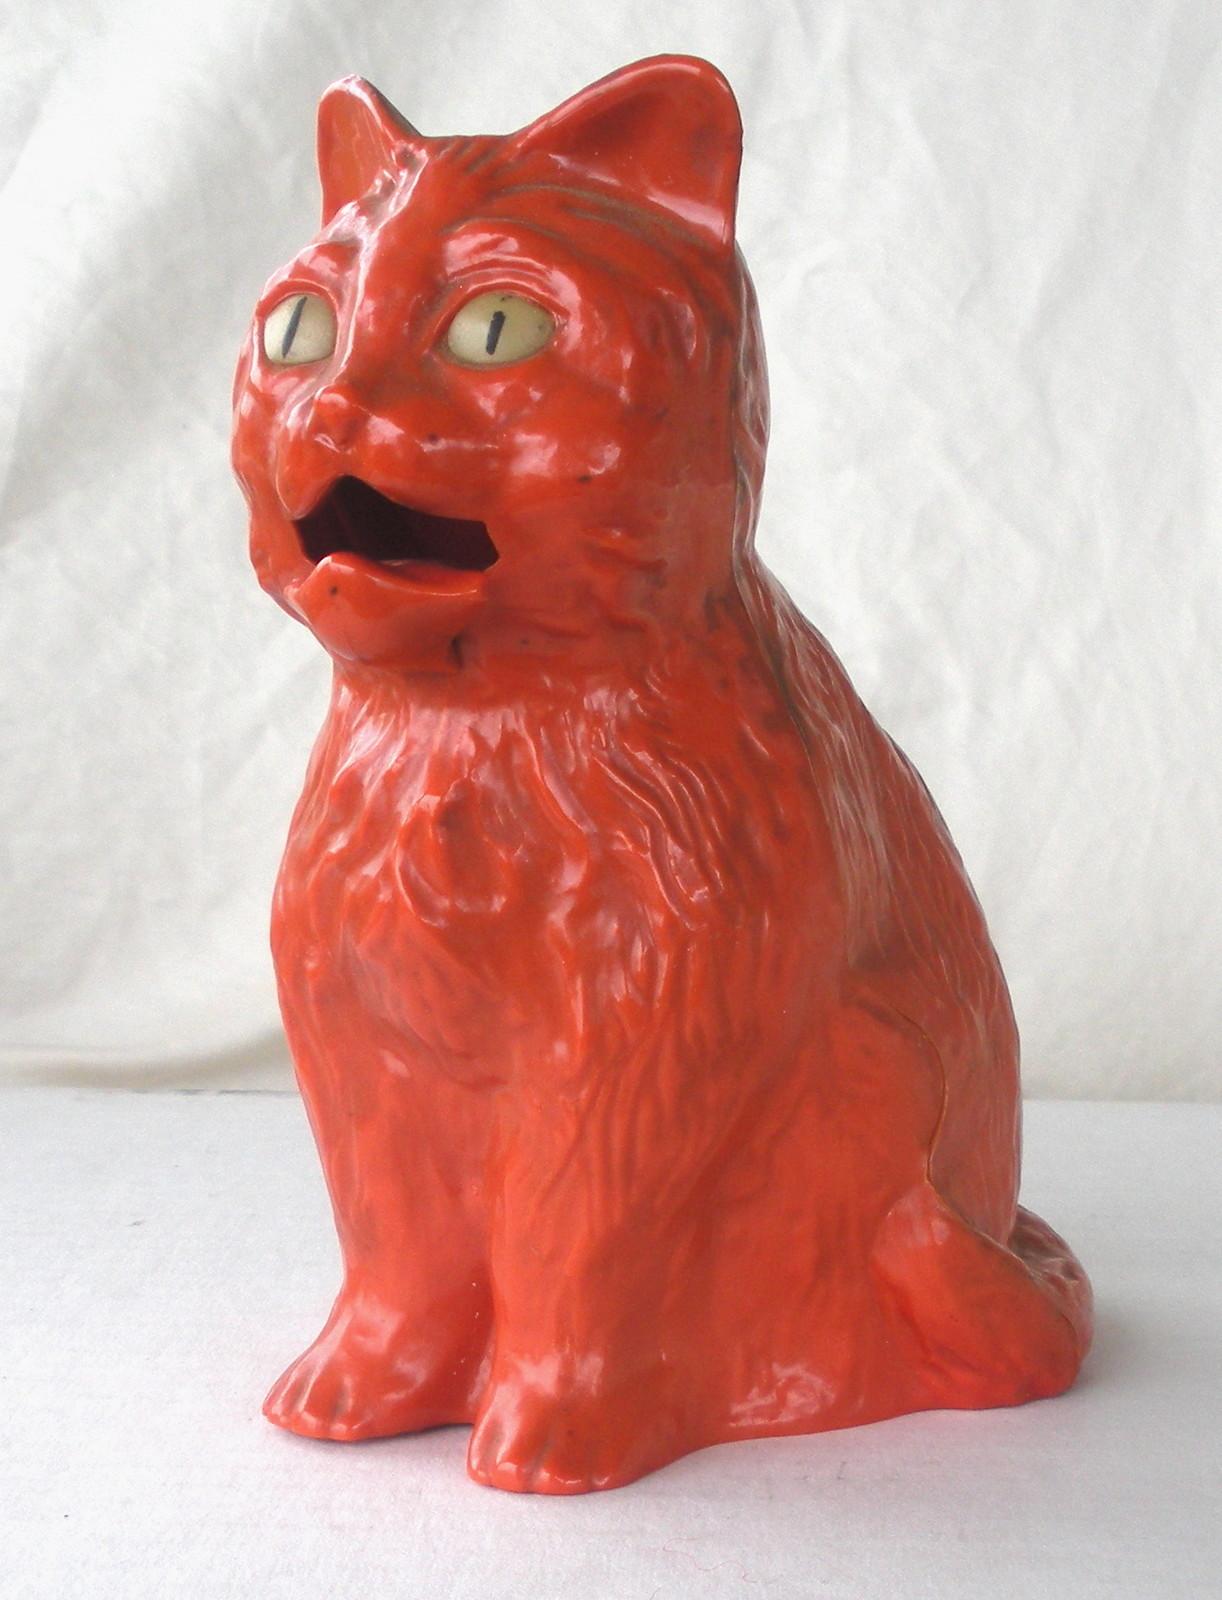 Vintage halloween decorations plastic - Rare 1950 S Vintage Hard Plastic Halloween Orange Cat Bank